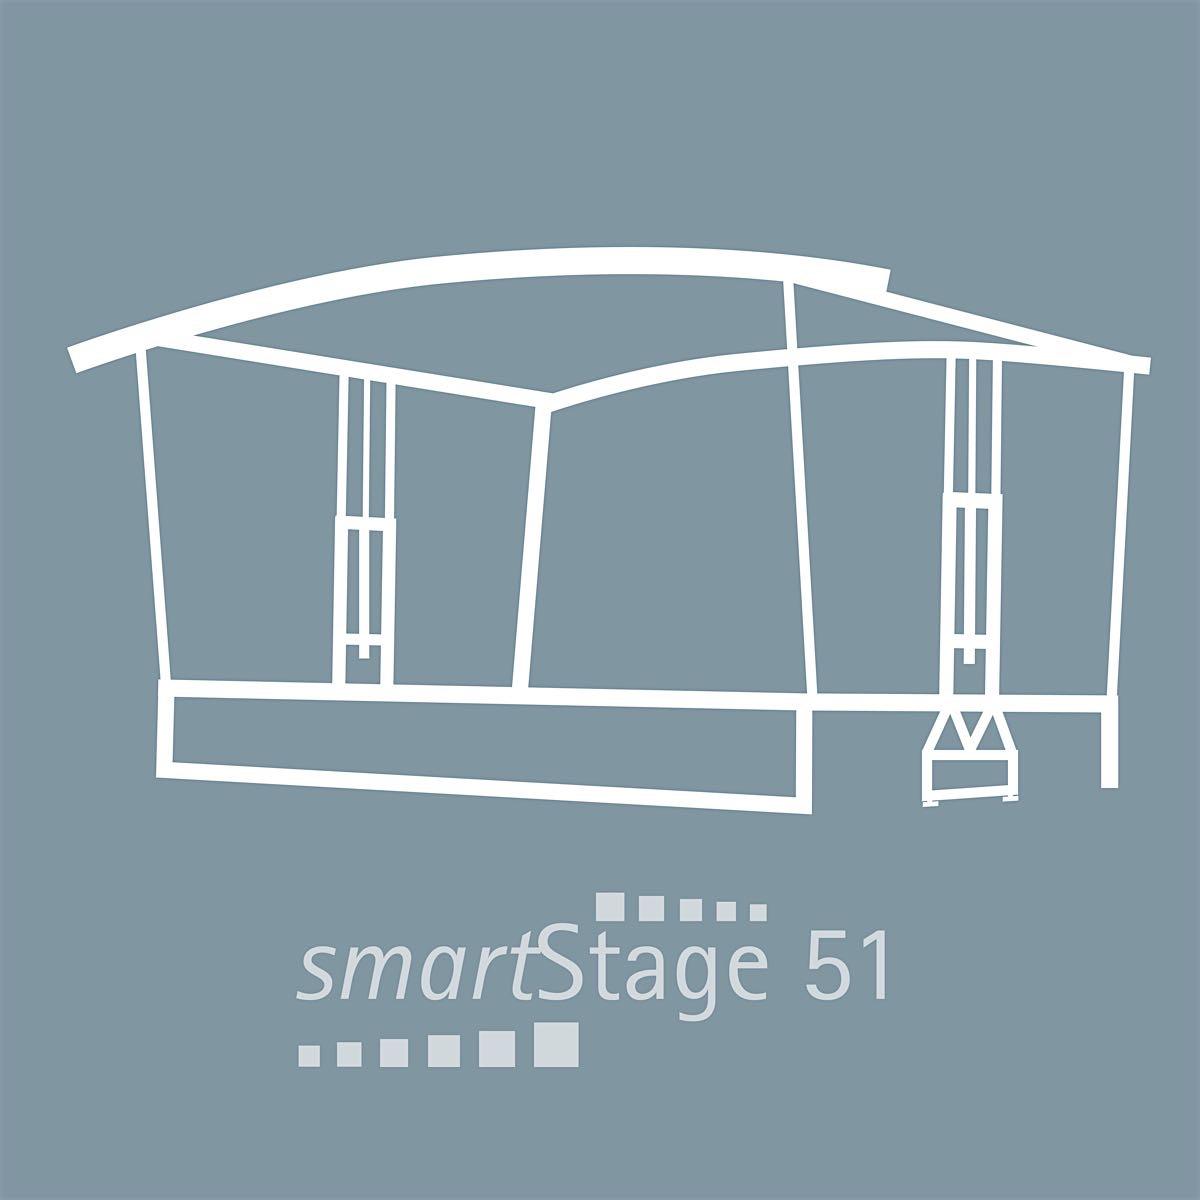 smartStage 51 - 49 qm area8.00 m Width6.20 m Depth4.95 m Height [5.30m]